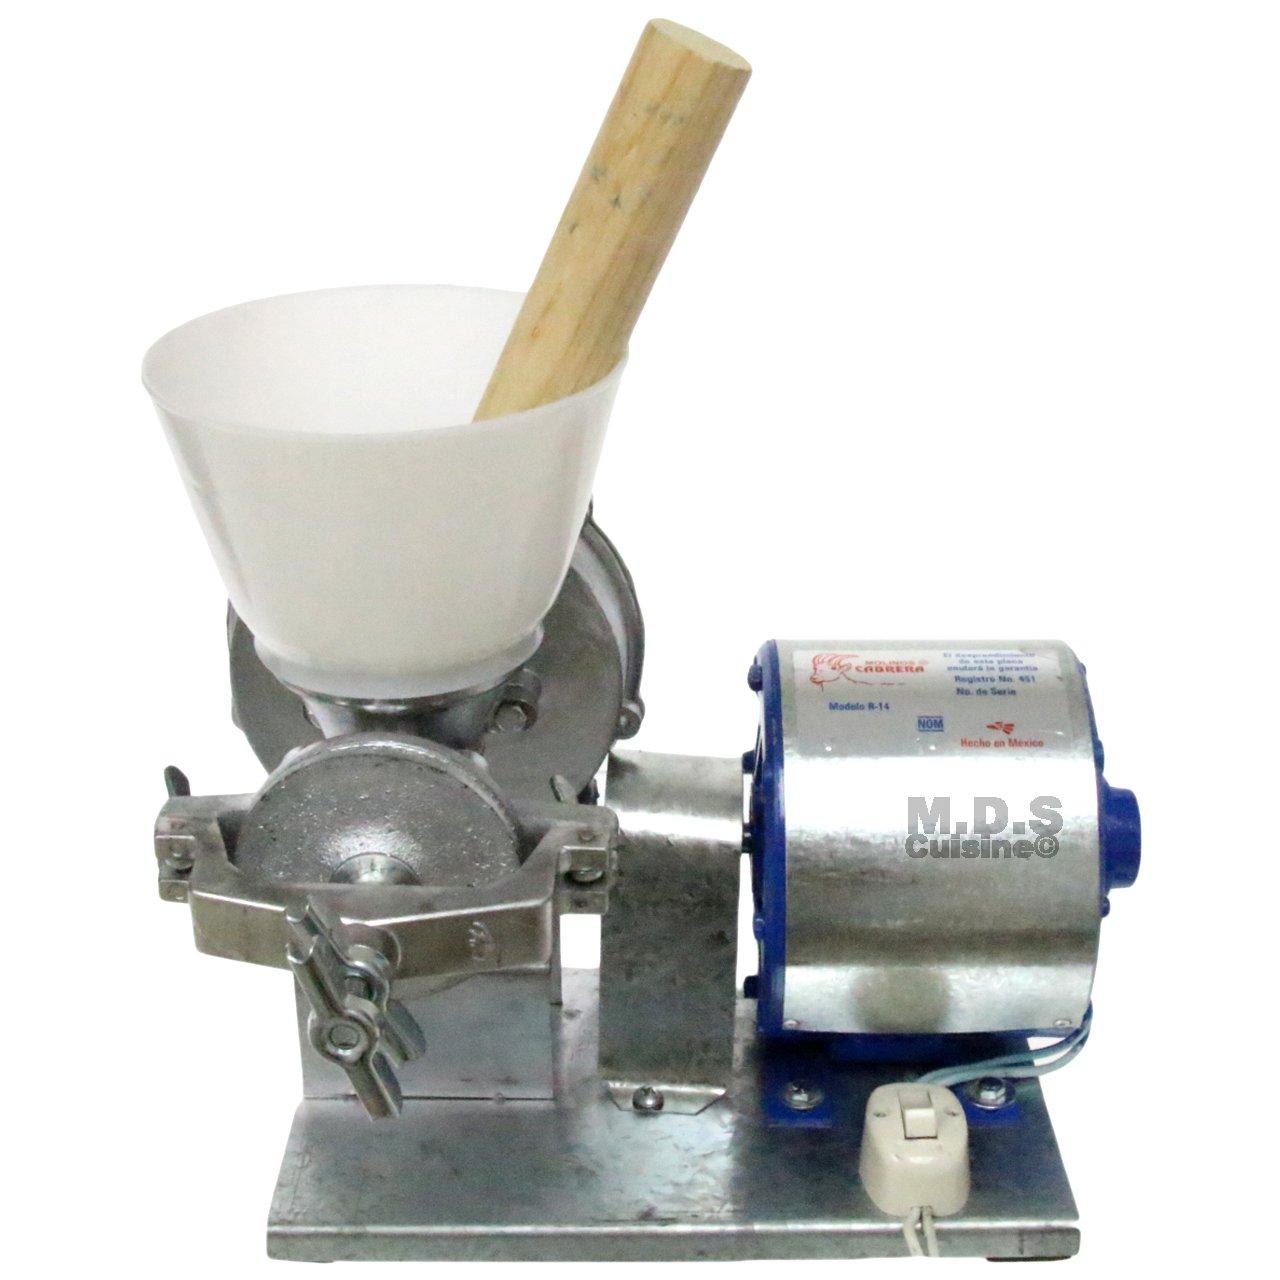 Electric Mill Corn Grain Wheat Grinder Heavy Duty Commercial Molino Maiz 1/4 HP